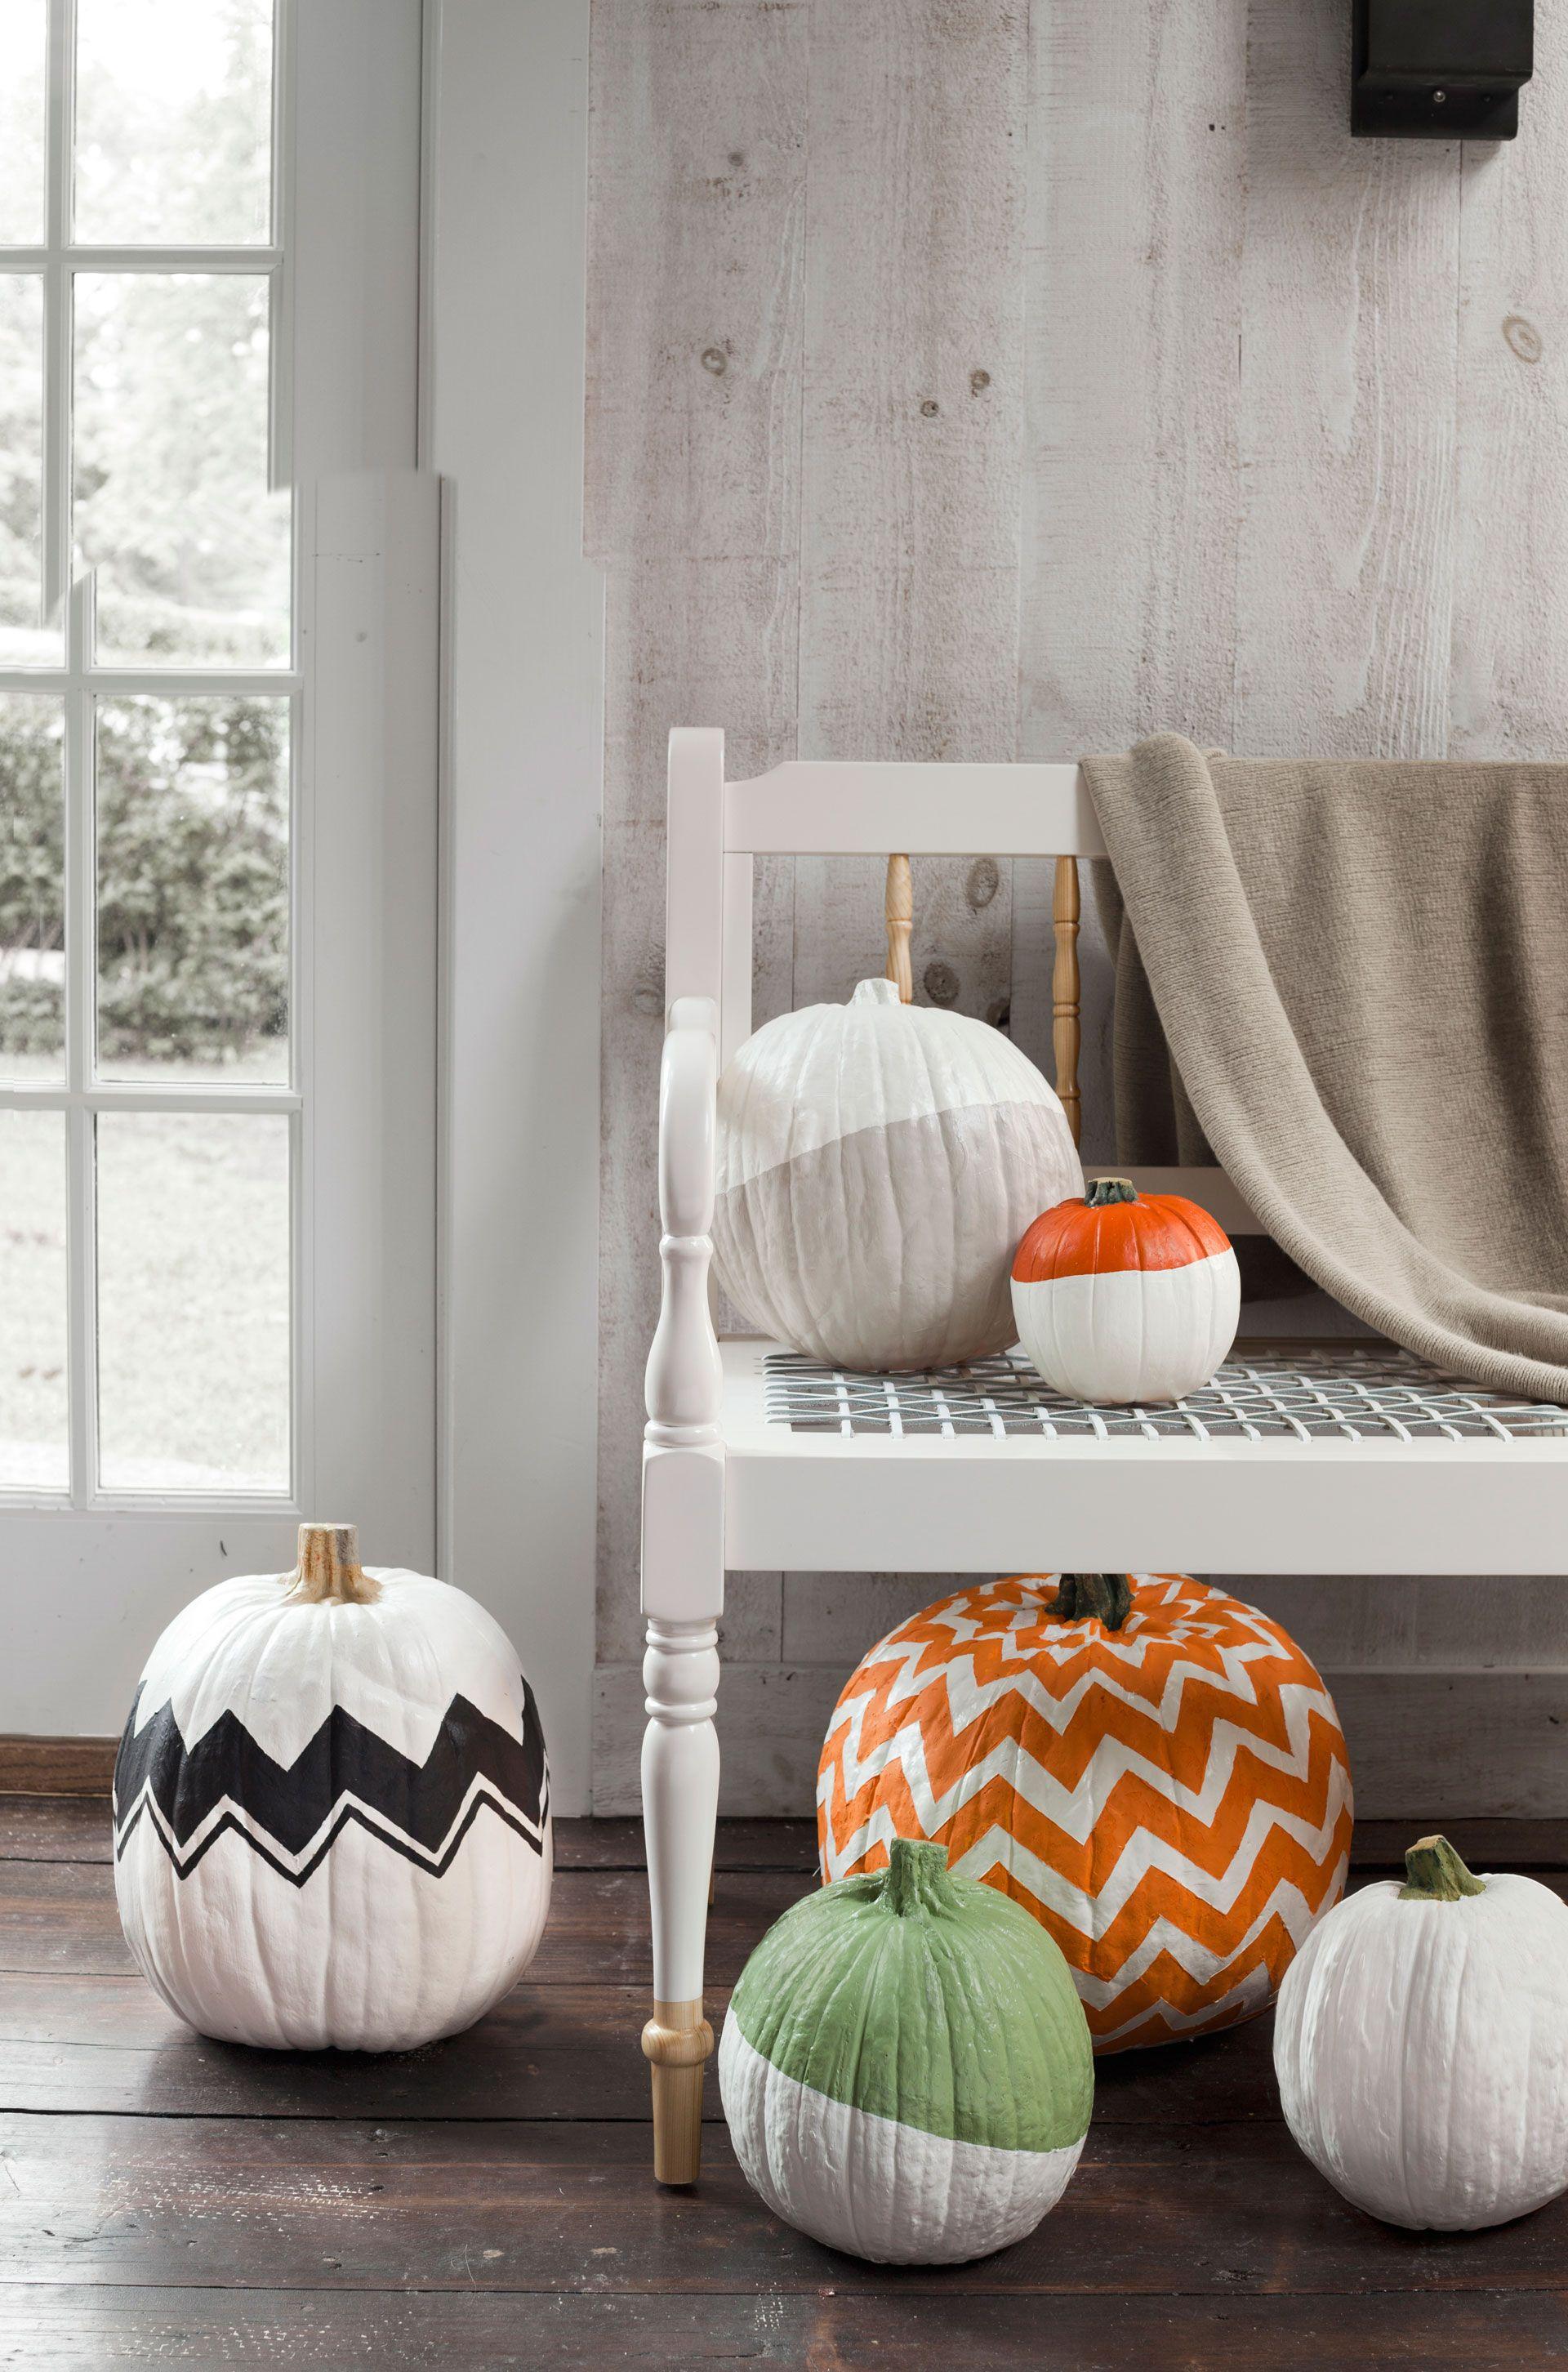 57 Easy Painted Pumpkins Ideas - No Carve Halloween Pumpkin Painting ...